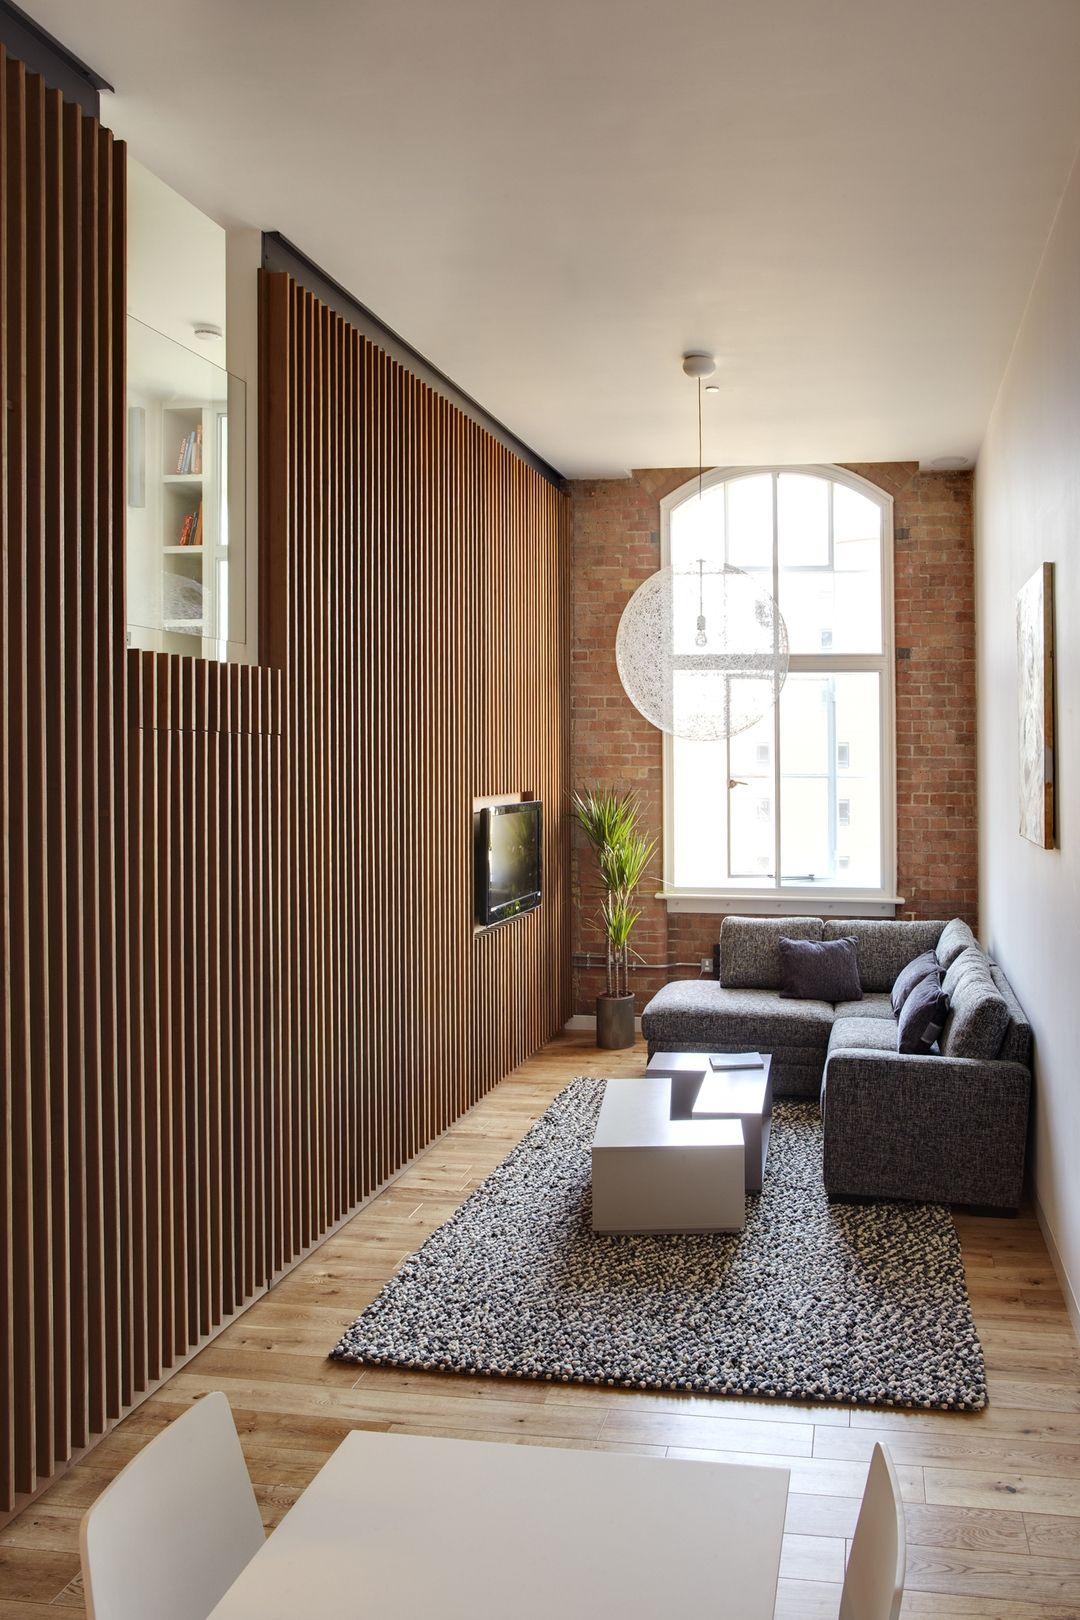 Apartment in Bow Quarter, London on Architizer | muebles | Pinterest